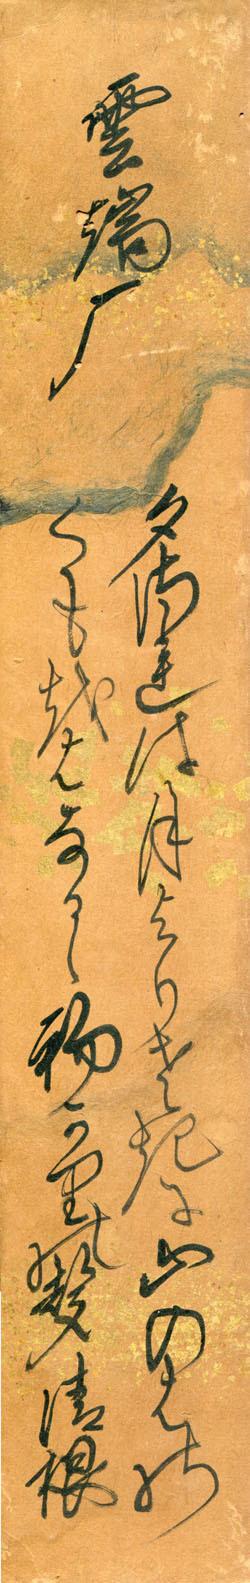 雲端雁 - daily-sumus2